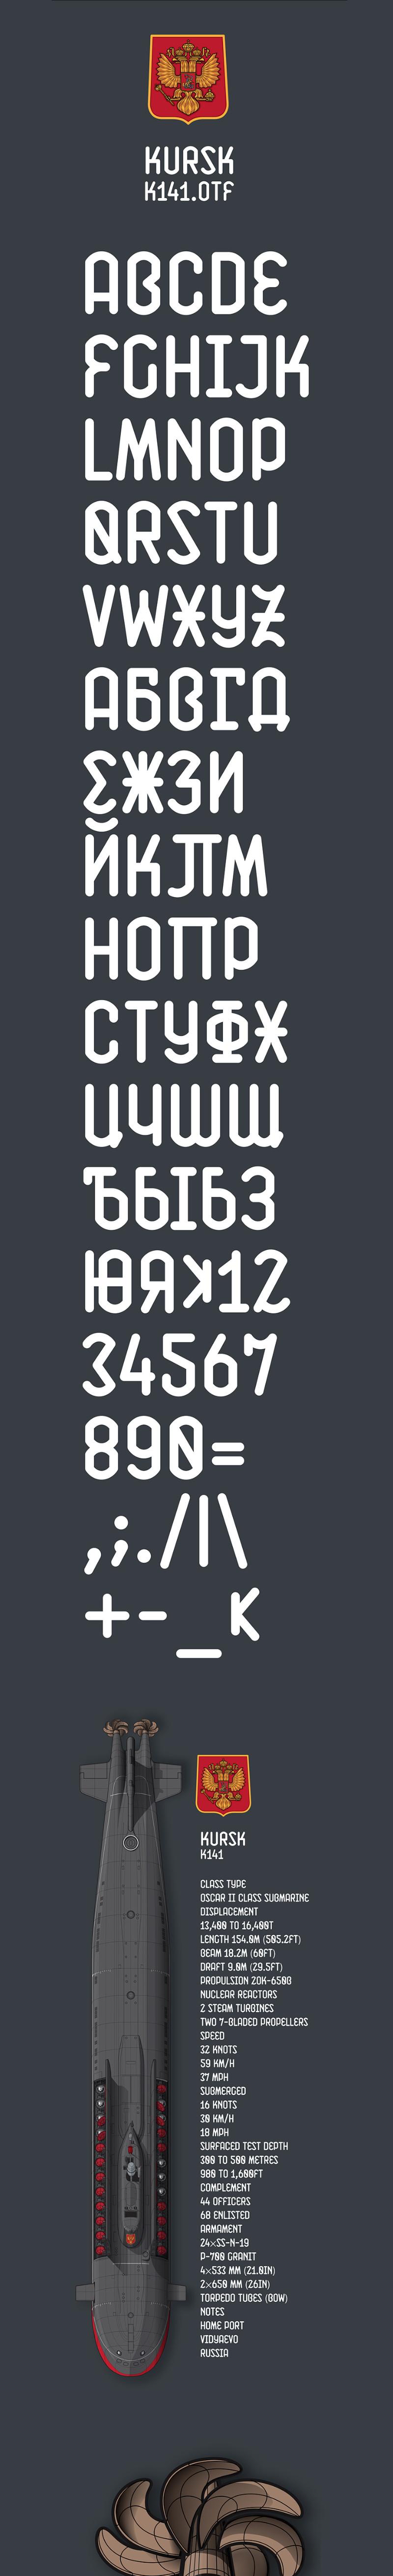 Kursk K141 Cyrillic Latin Script Font Bypeople